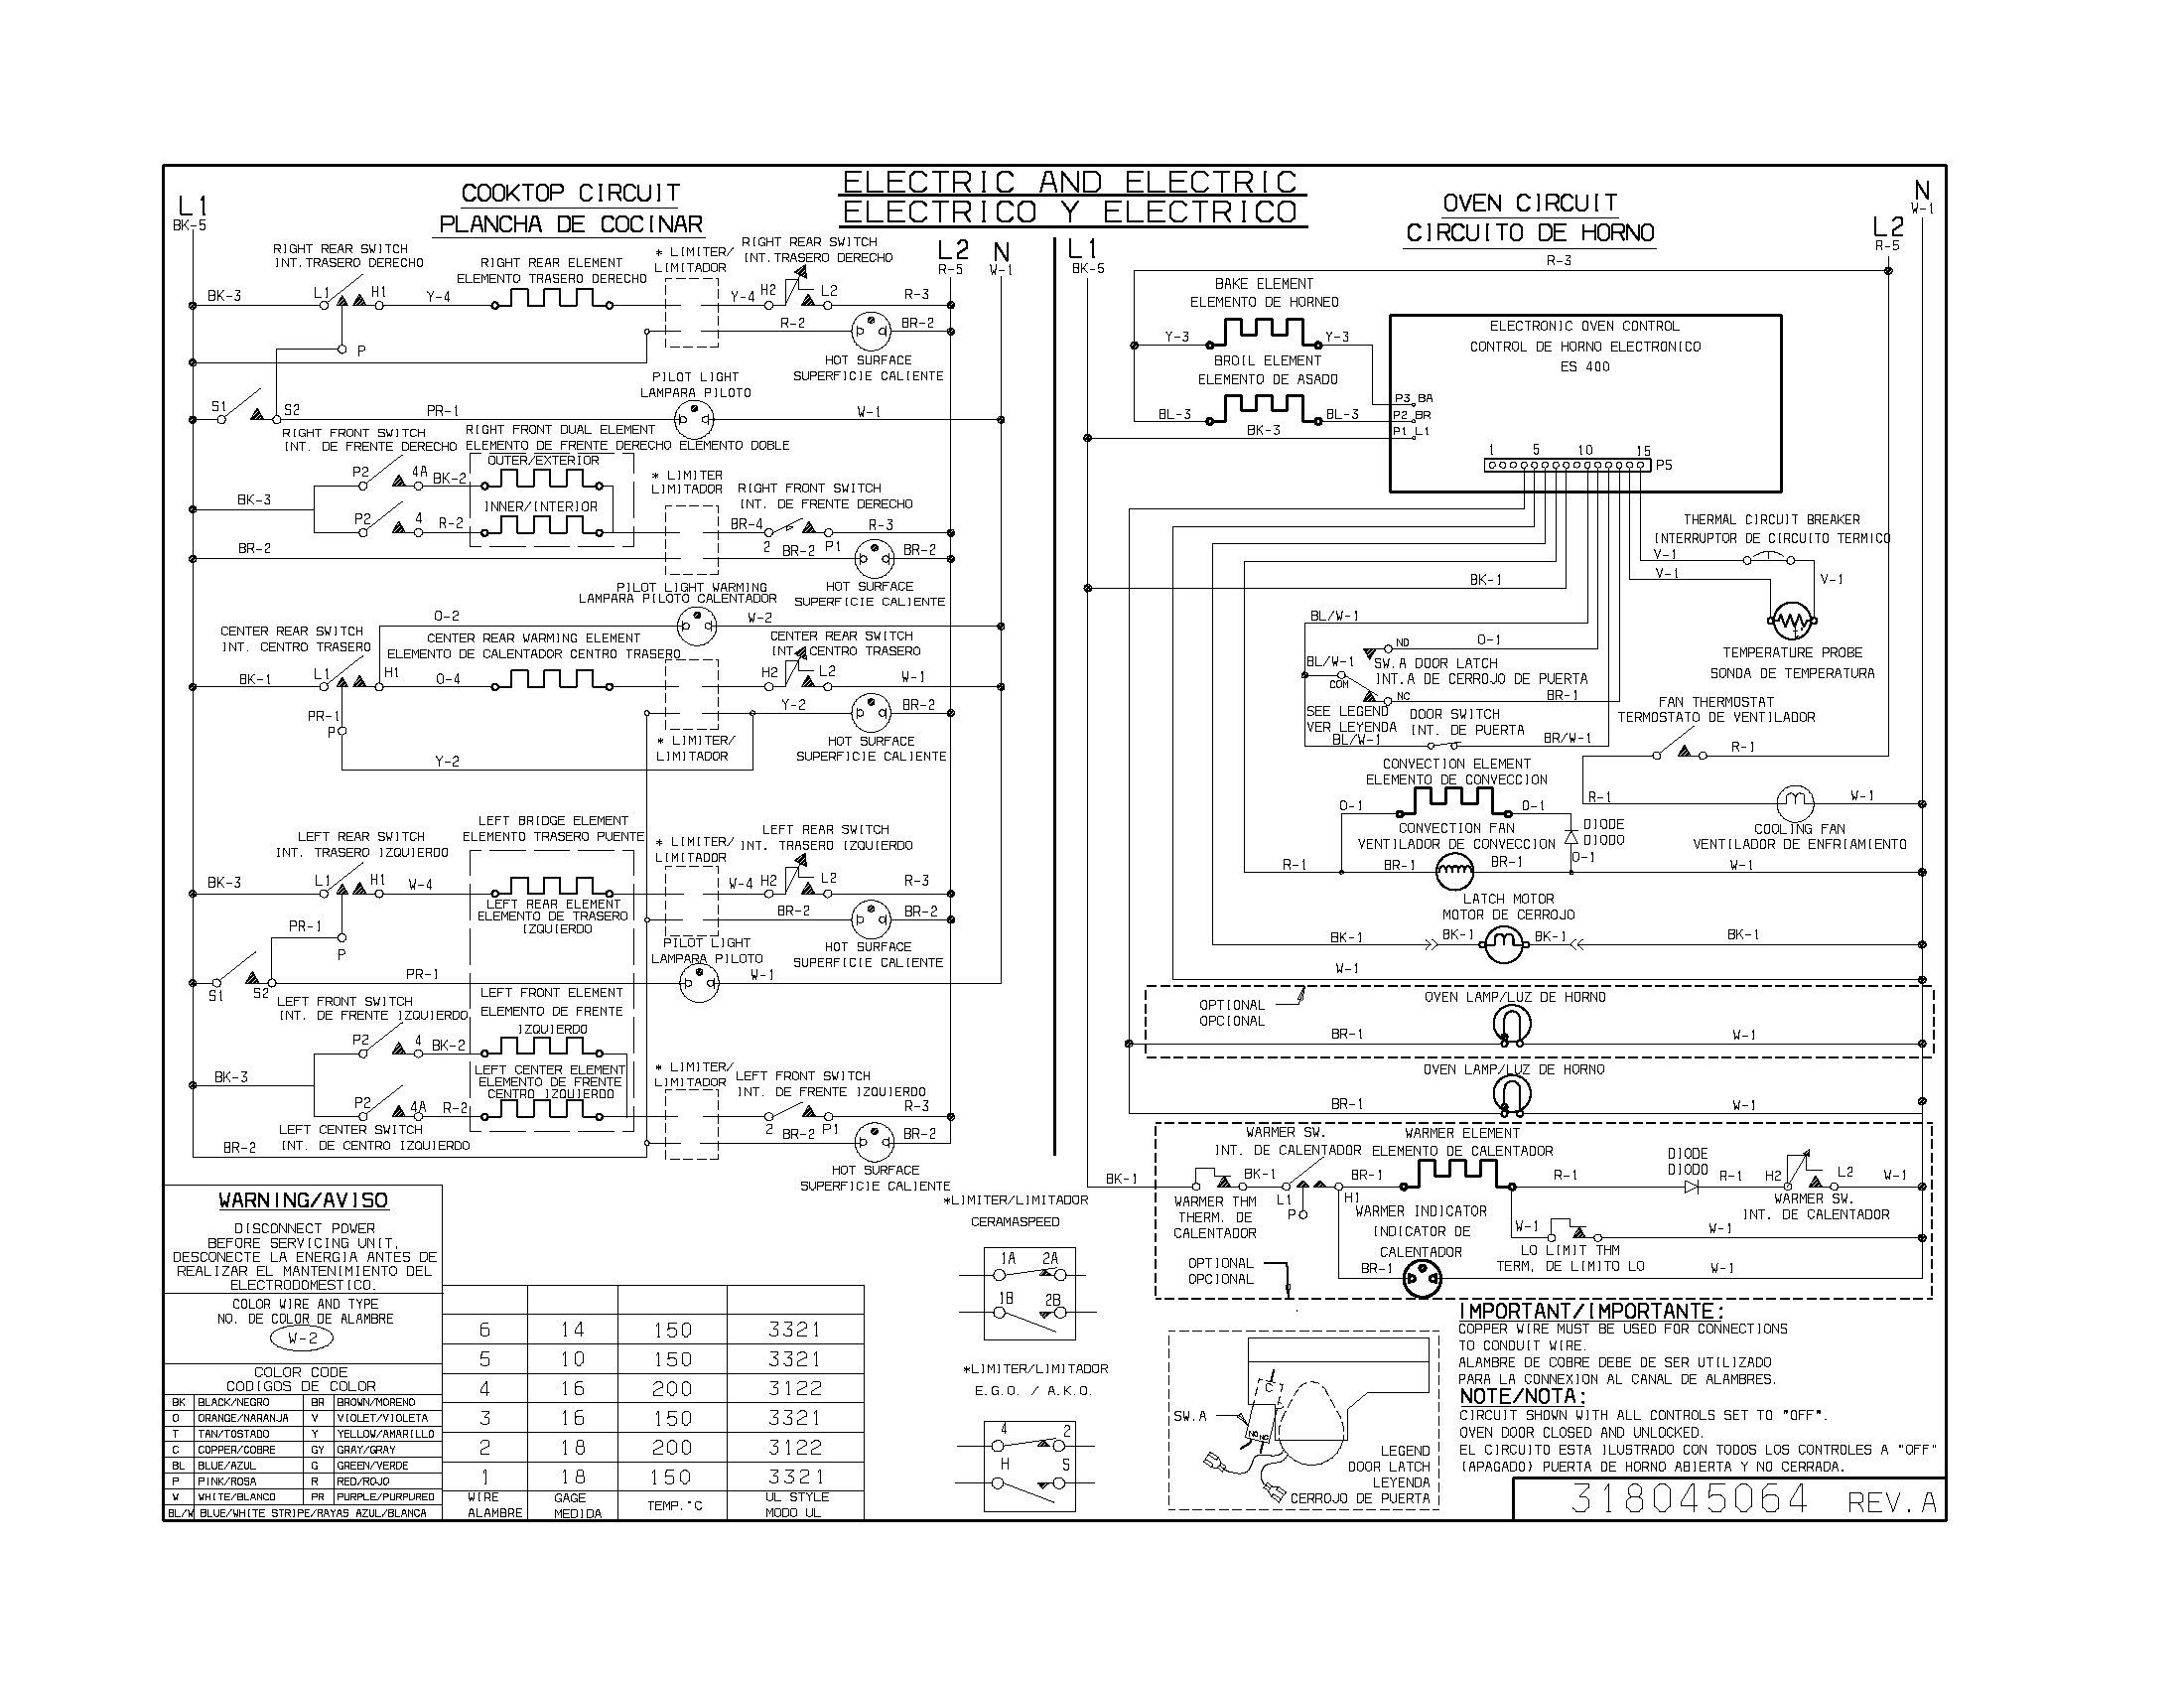 wiring diagram parts?resize\\\\\\\=665%2C514\\\\\\\&ssl\\\\\\\=1 wiring diagram for viking stove gandul 45 77 79 119  at crackthecode.co